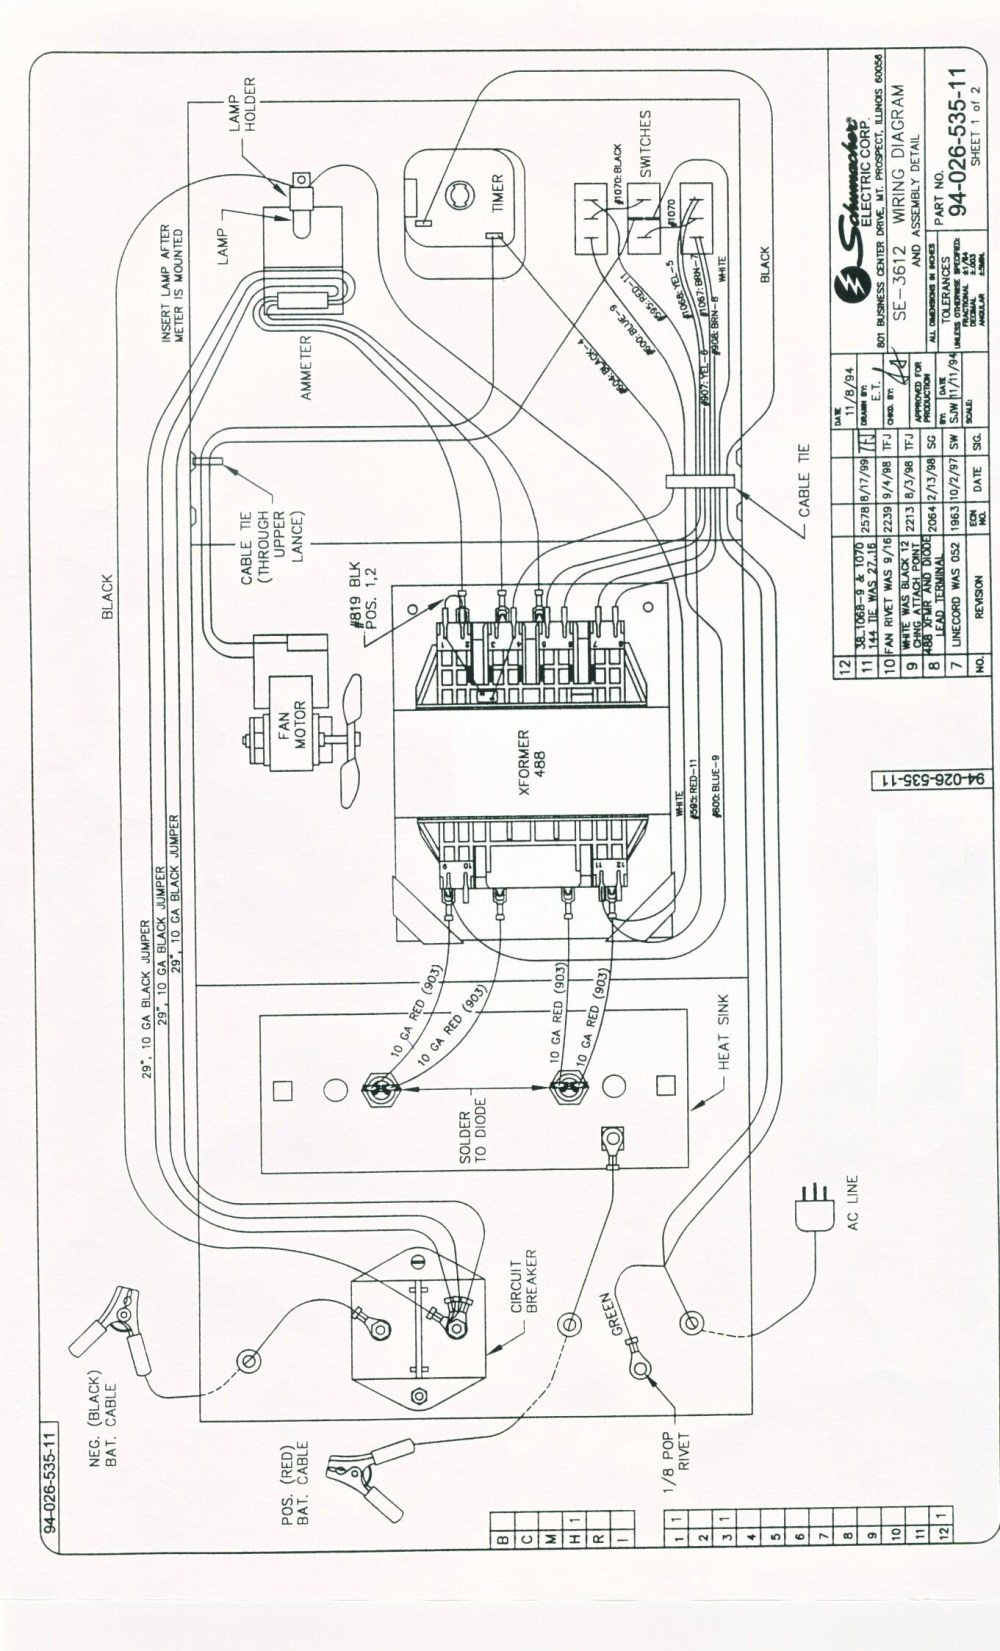 medium resolution of schumacher battery charger se 82 6 wiring diagram collection schumacher se 5212a wiring diagram new download wiring diagram